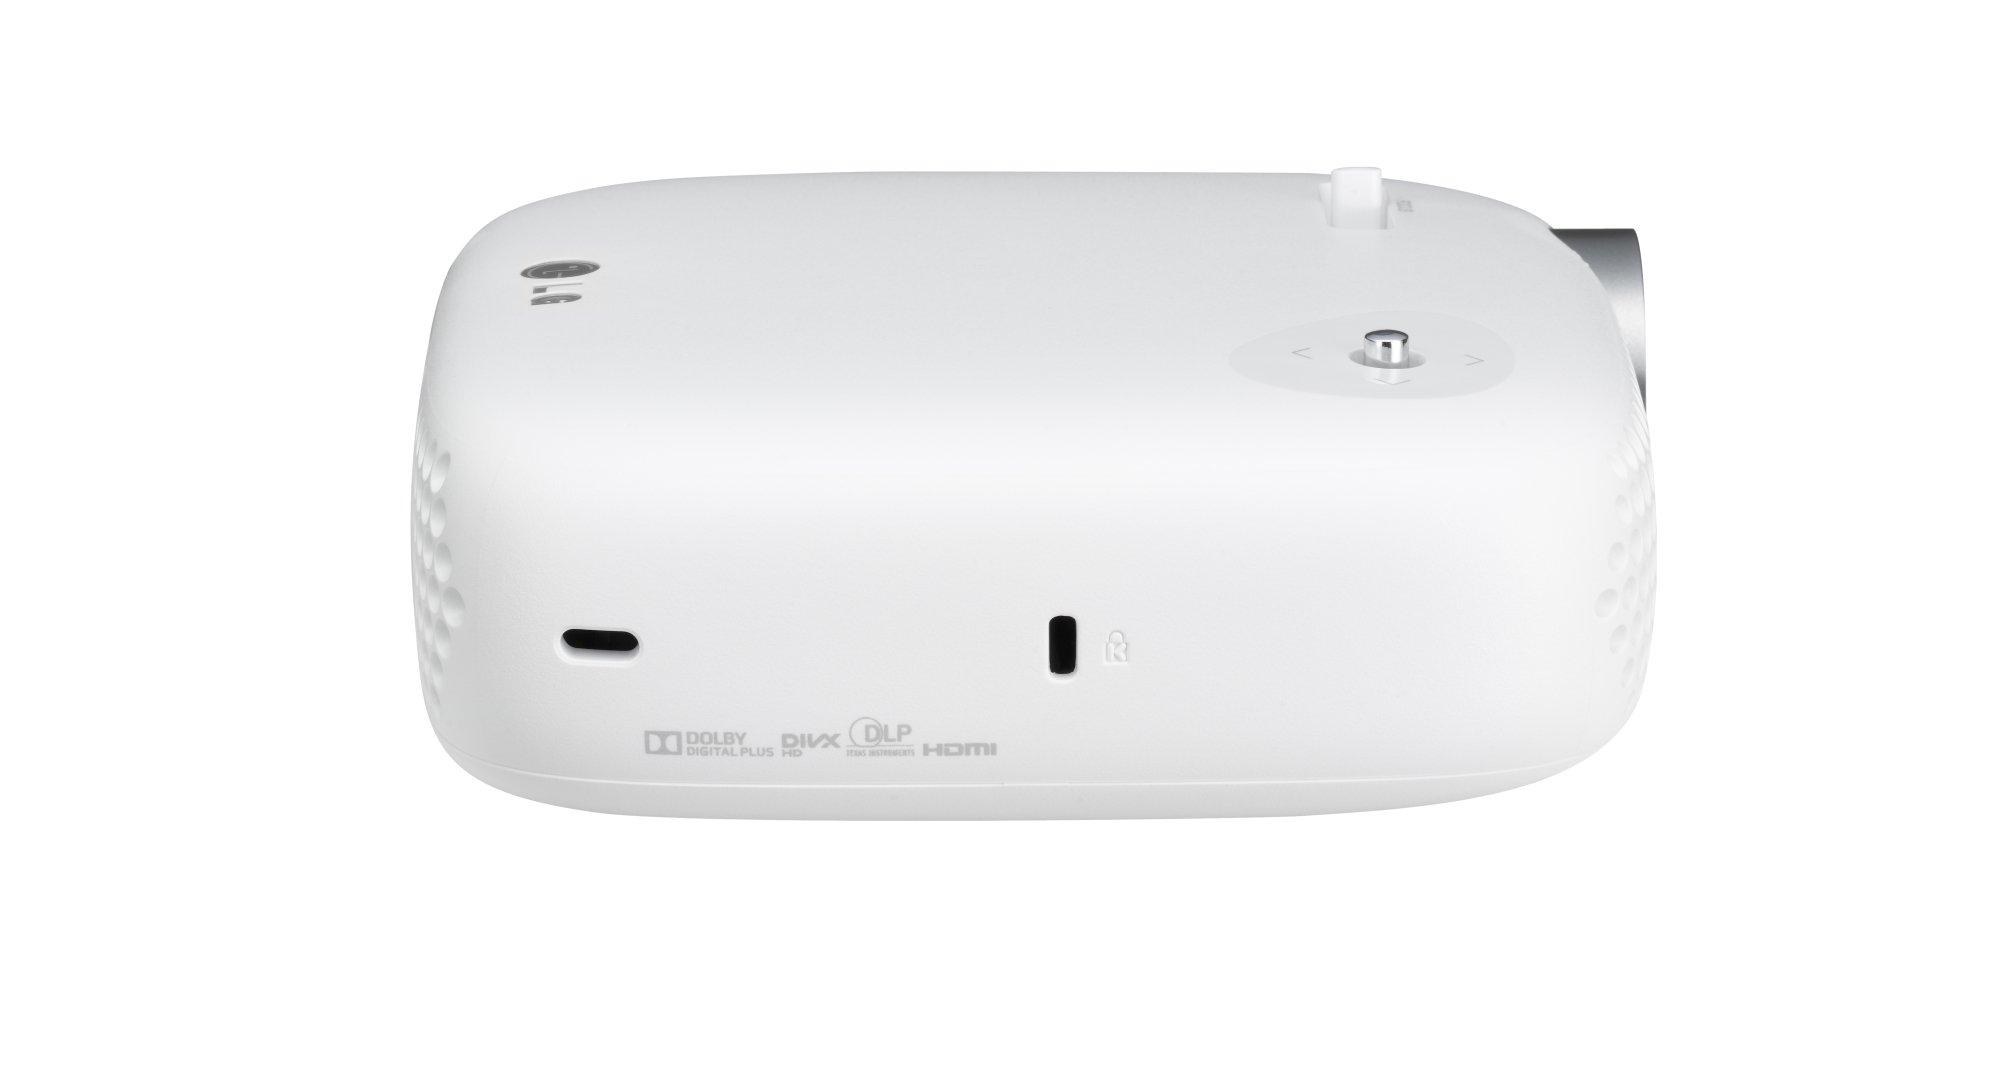 LG PW600G.AEU - Proyector, 600 lúmenes ANSI, color blanco: LG ...